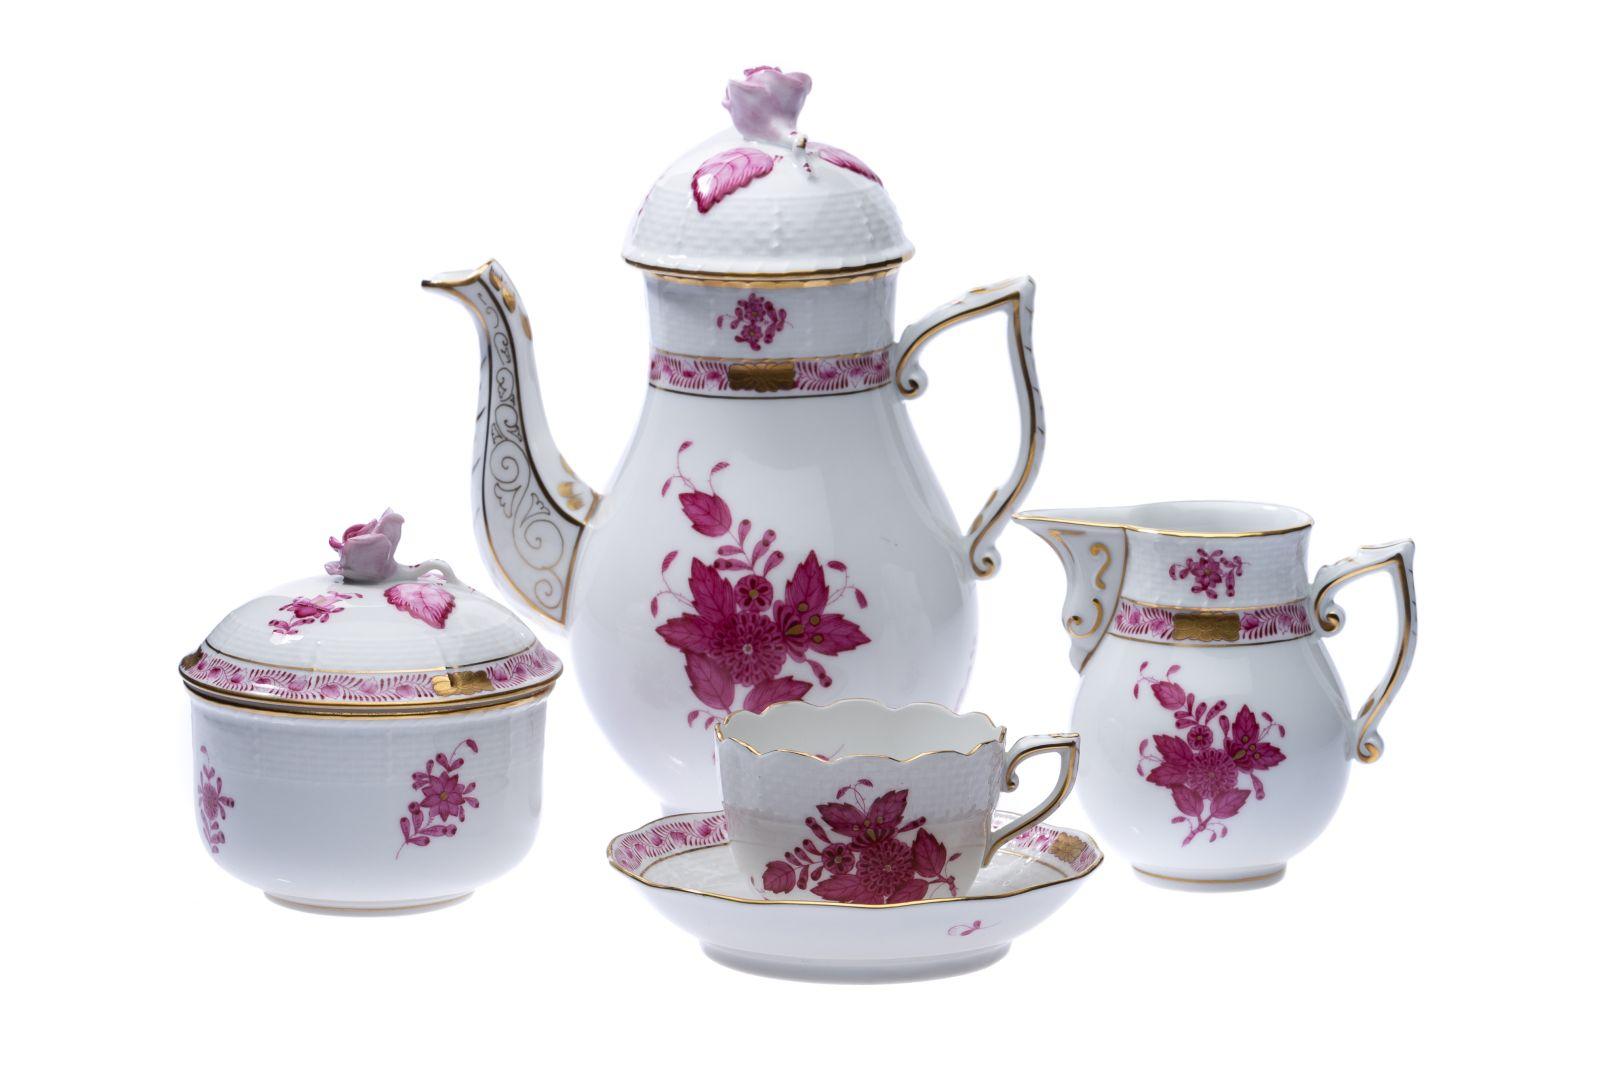 "#10 Herend Moccaservice 15 pieces form Osier decor ""Apponyi purpur"" | Herend Moccaservice 15 teilig  Form Osier Dekor ""Apponyi purpur"" Image"